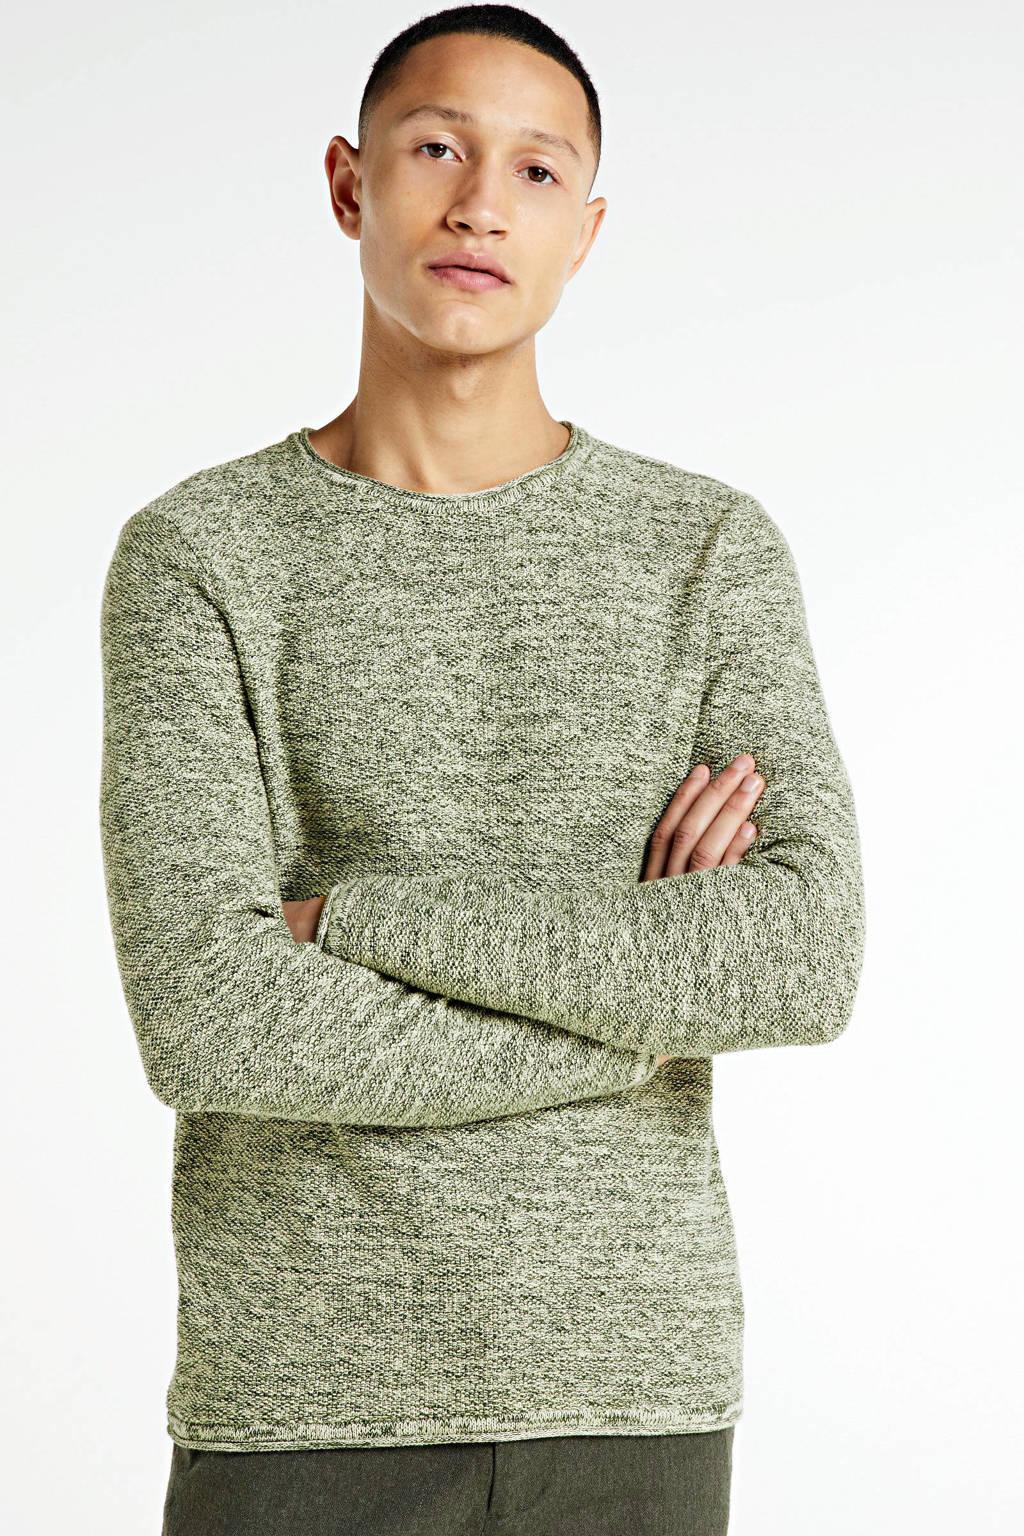 Redefined Rebel gemêleerde fijngebreide trui Maximo groen, Groen